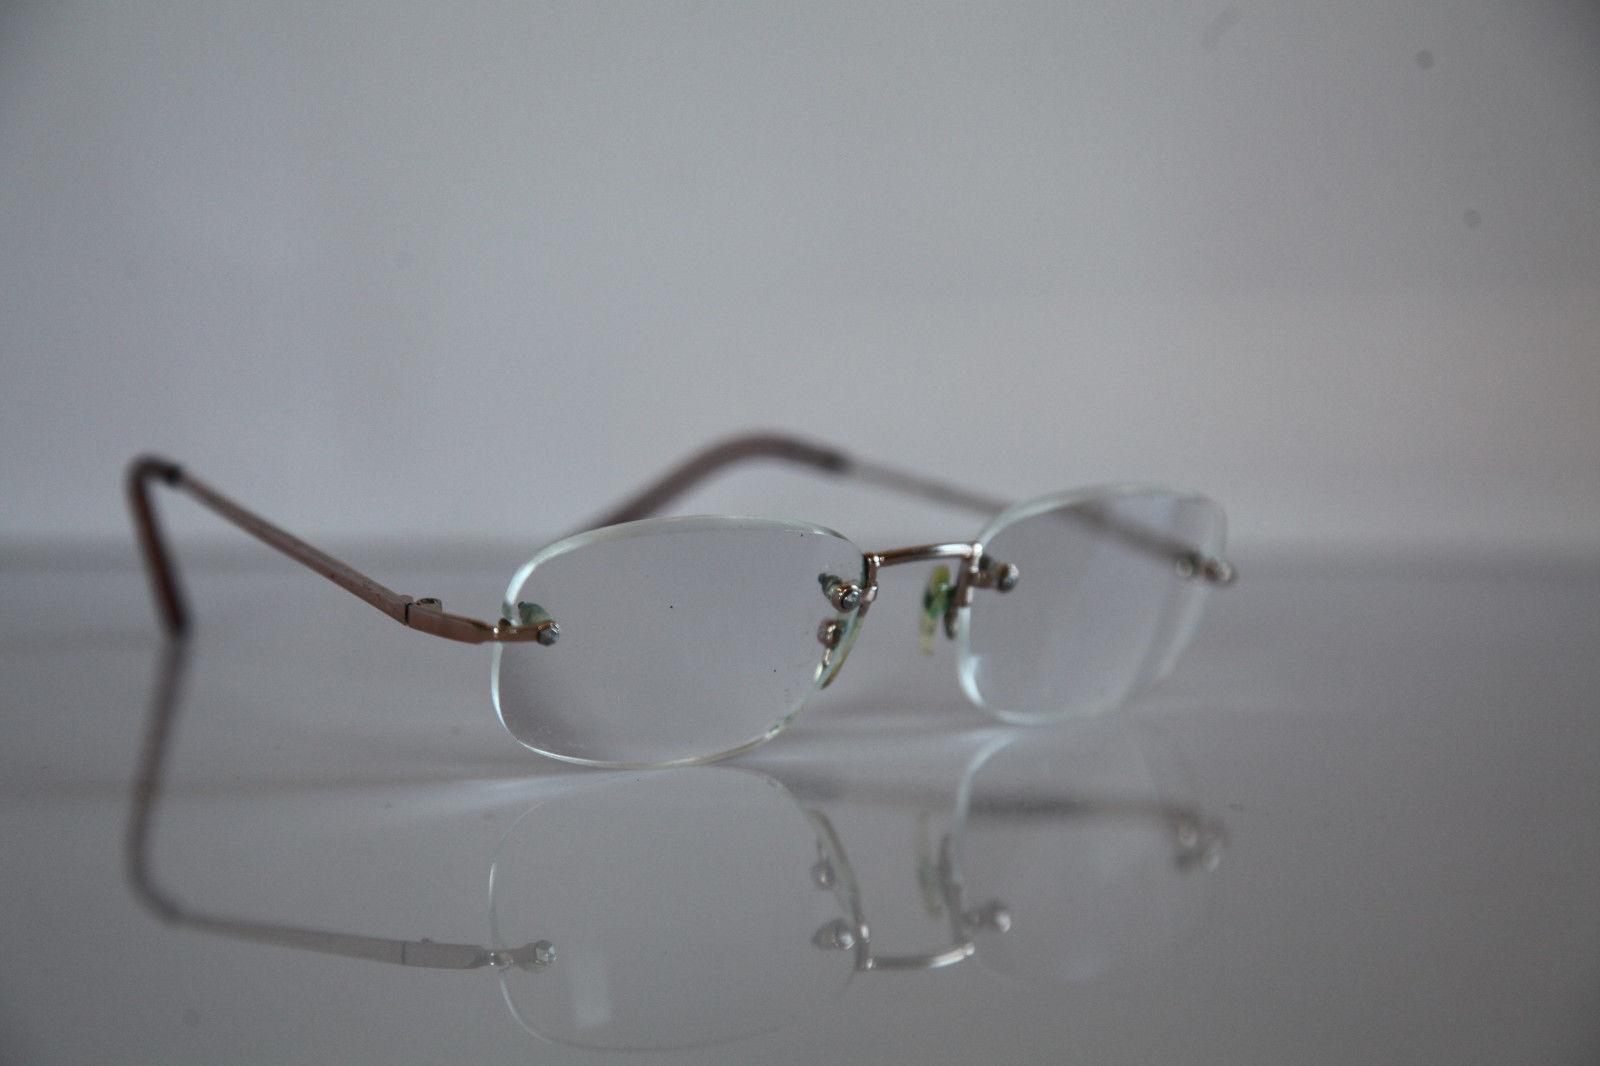 Eyewear, Gold Frame,  RX-Able Prescription lenses